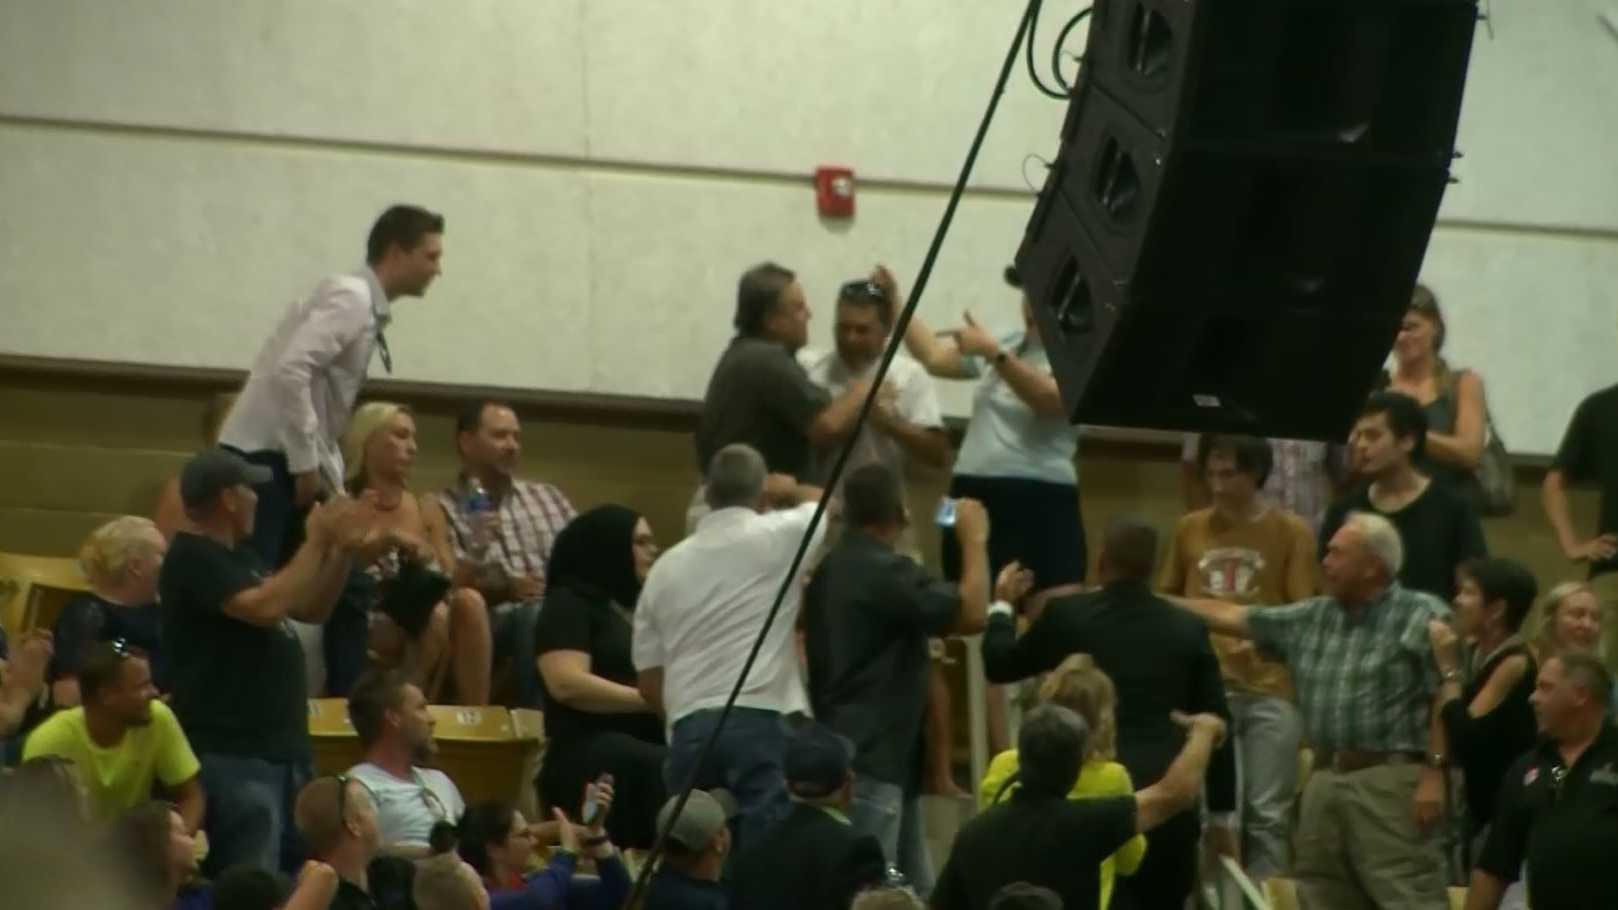 Trump rally assaults, arrests